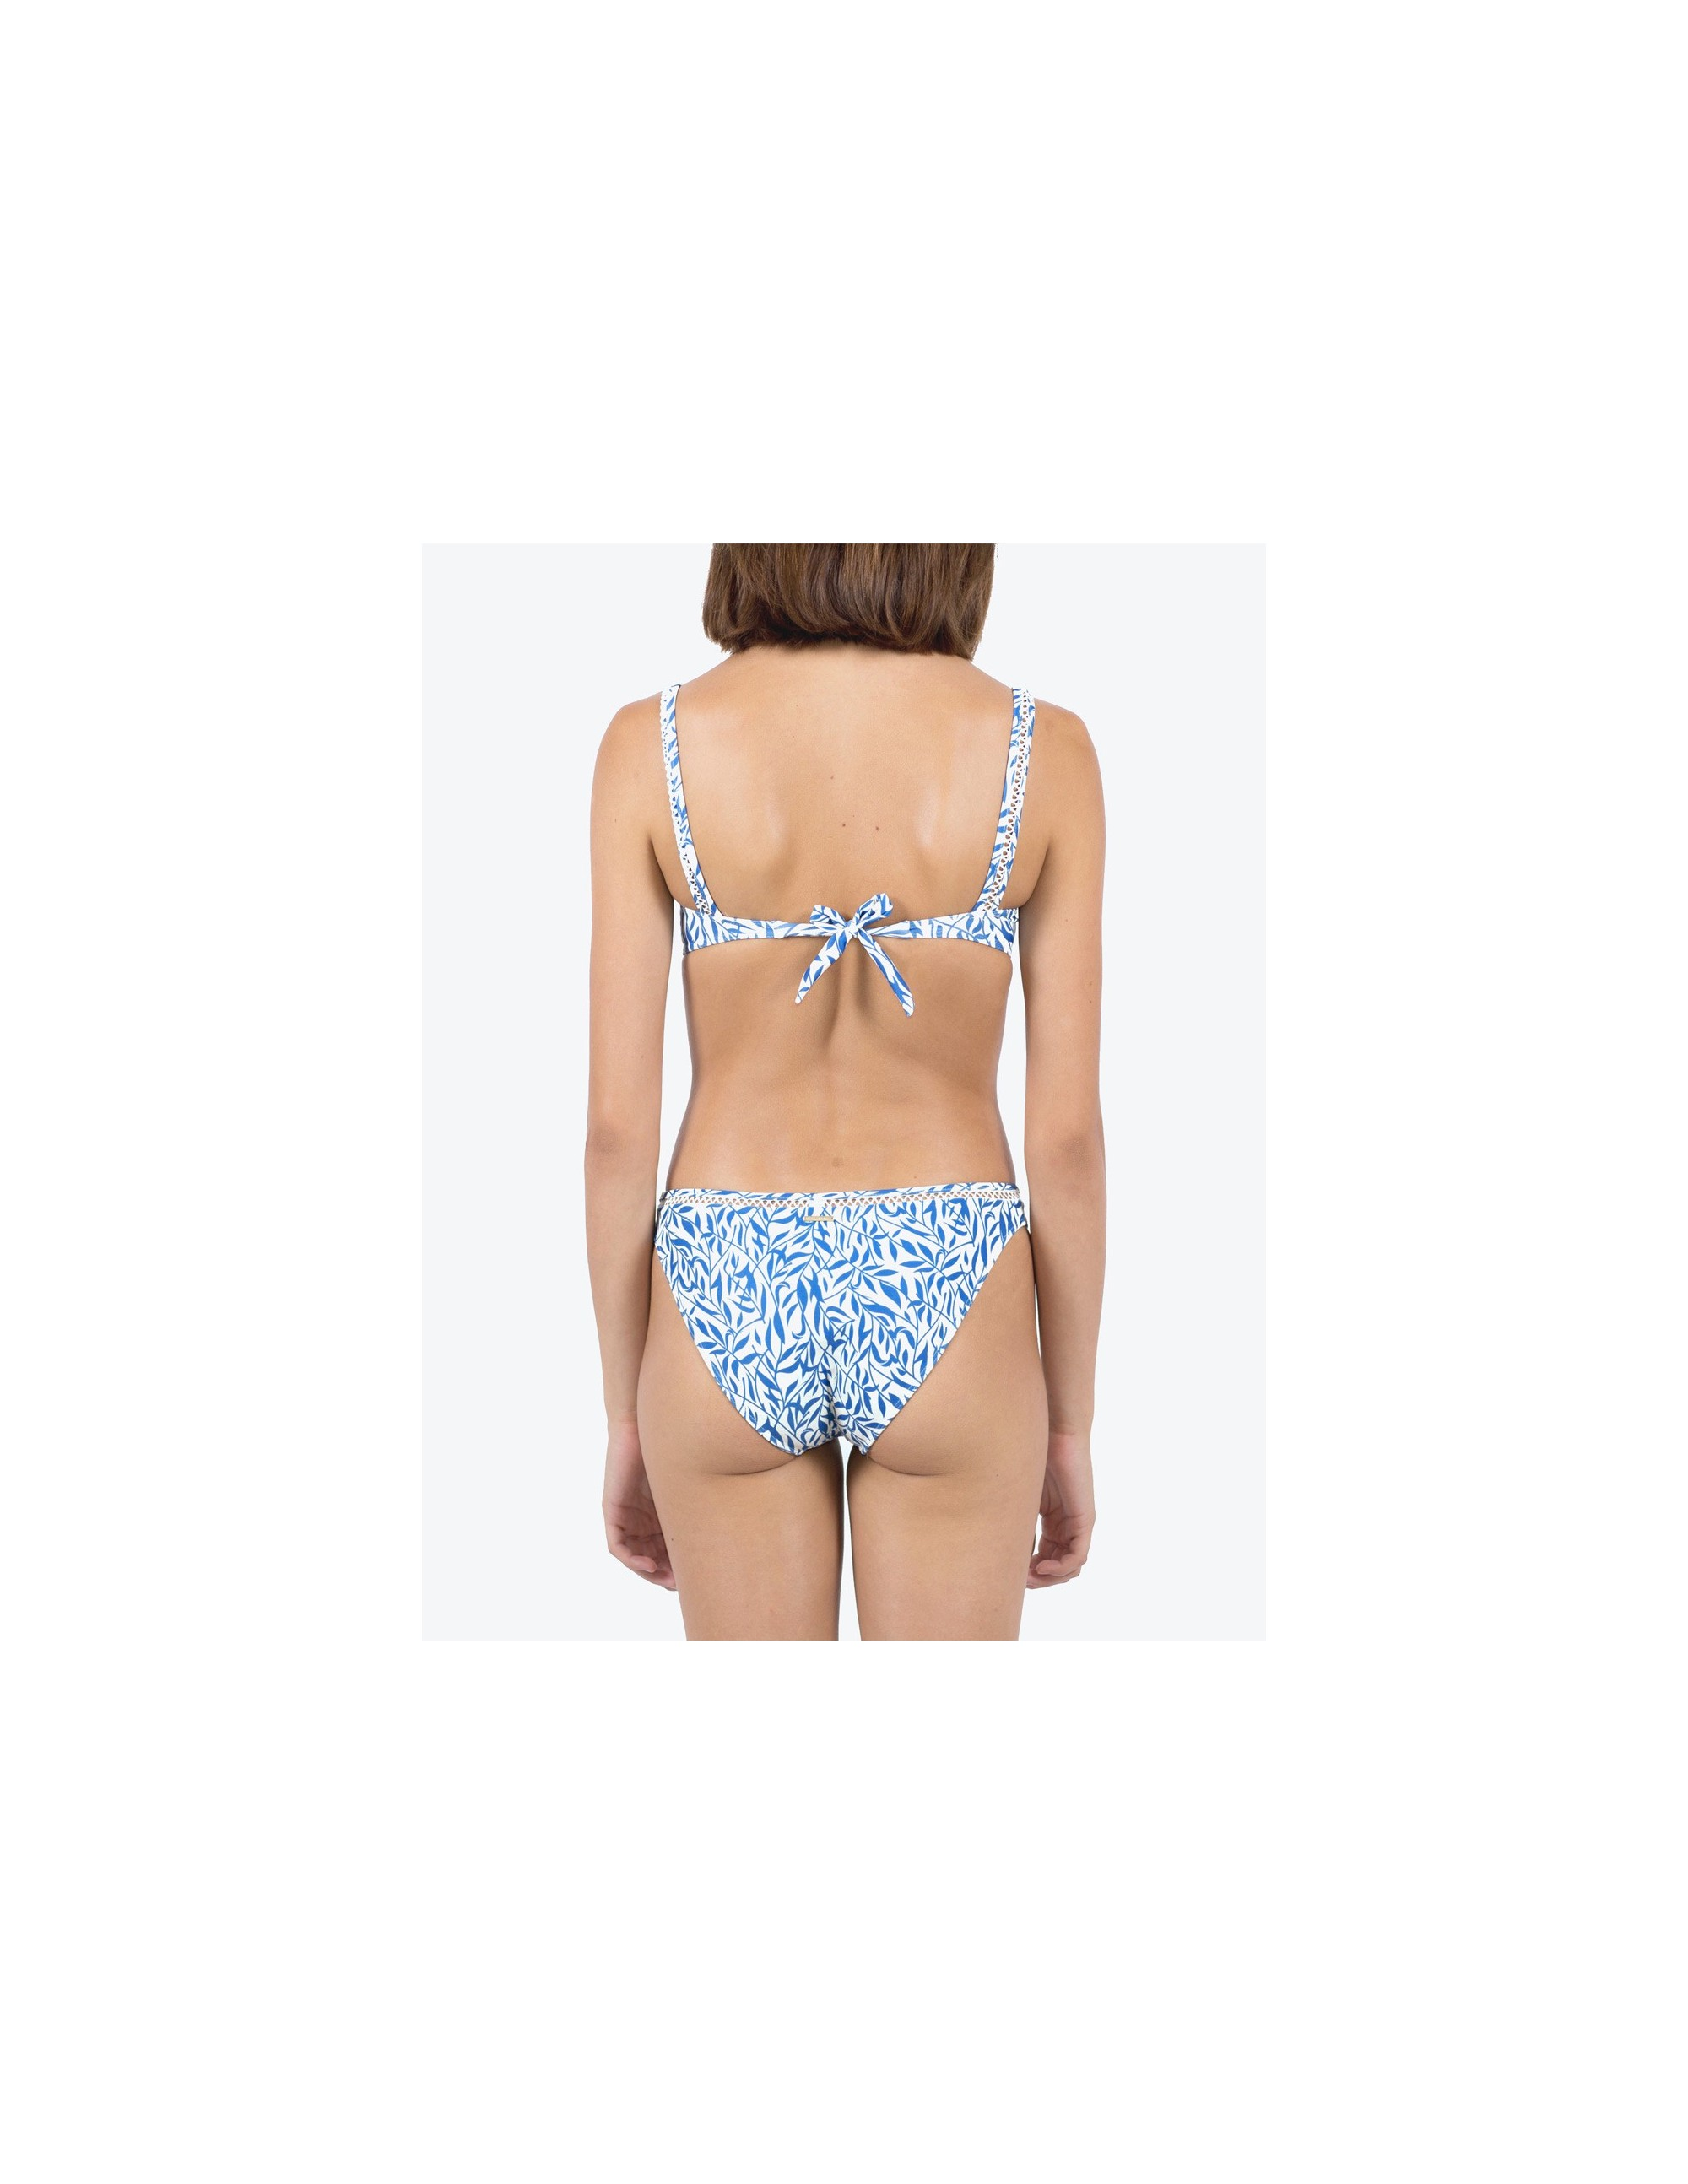 BELLA bikini bottom - FLORAL BLUE